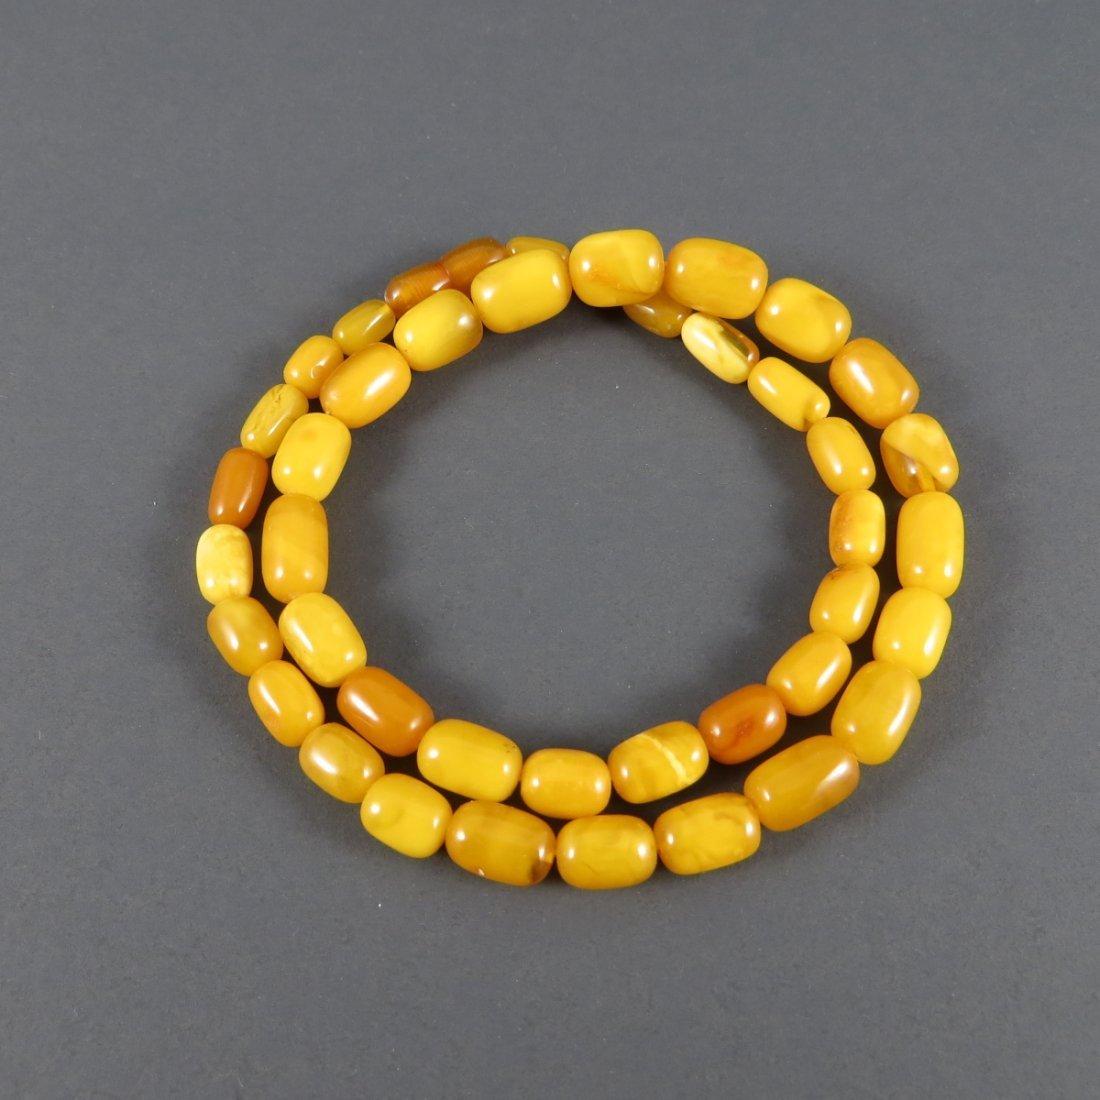 Amber/Butterscotch Necklace